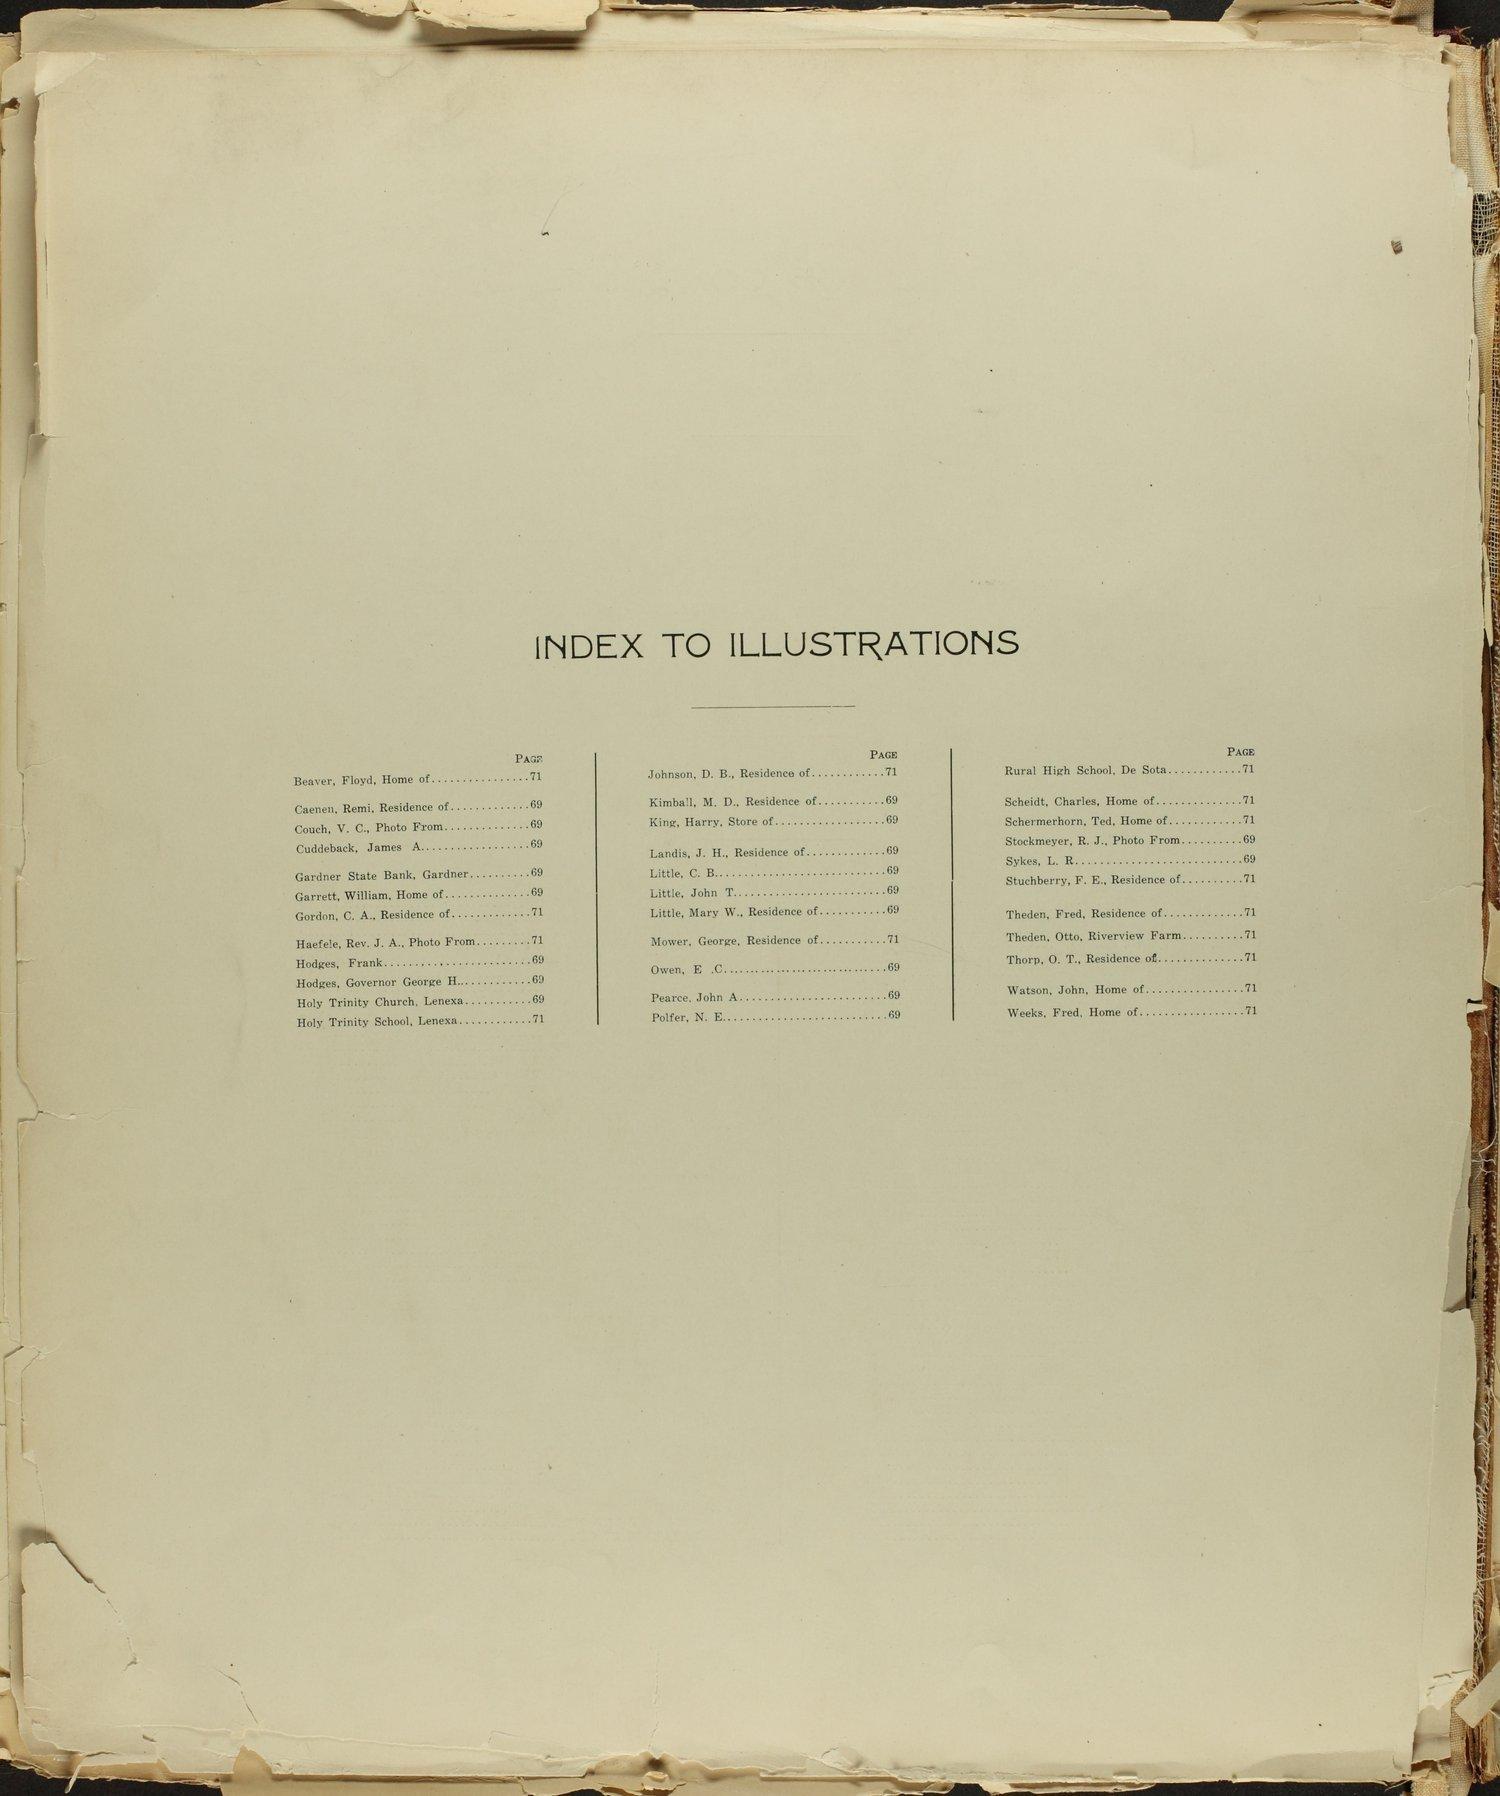 Standard atlas of Johnson County, Kansas - Index to Illustrations